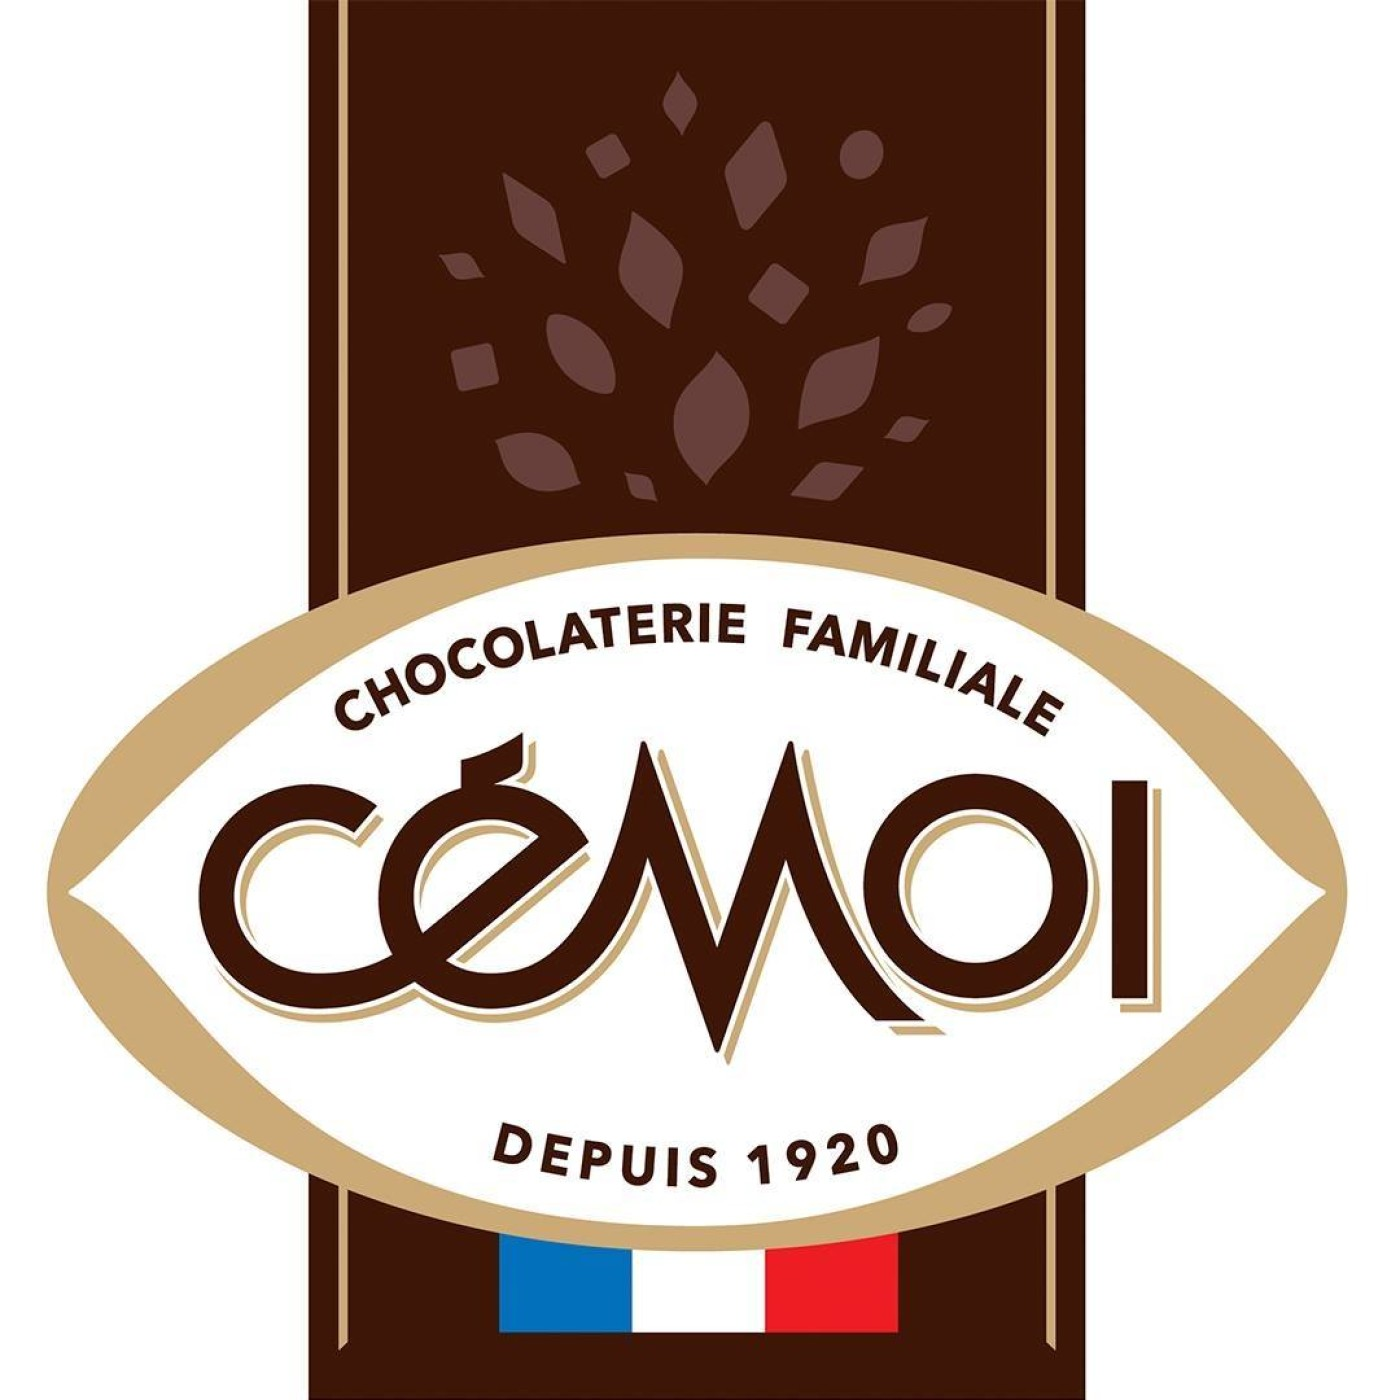 Catherine Poirrier du chocolatier Cémoi